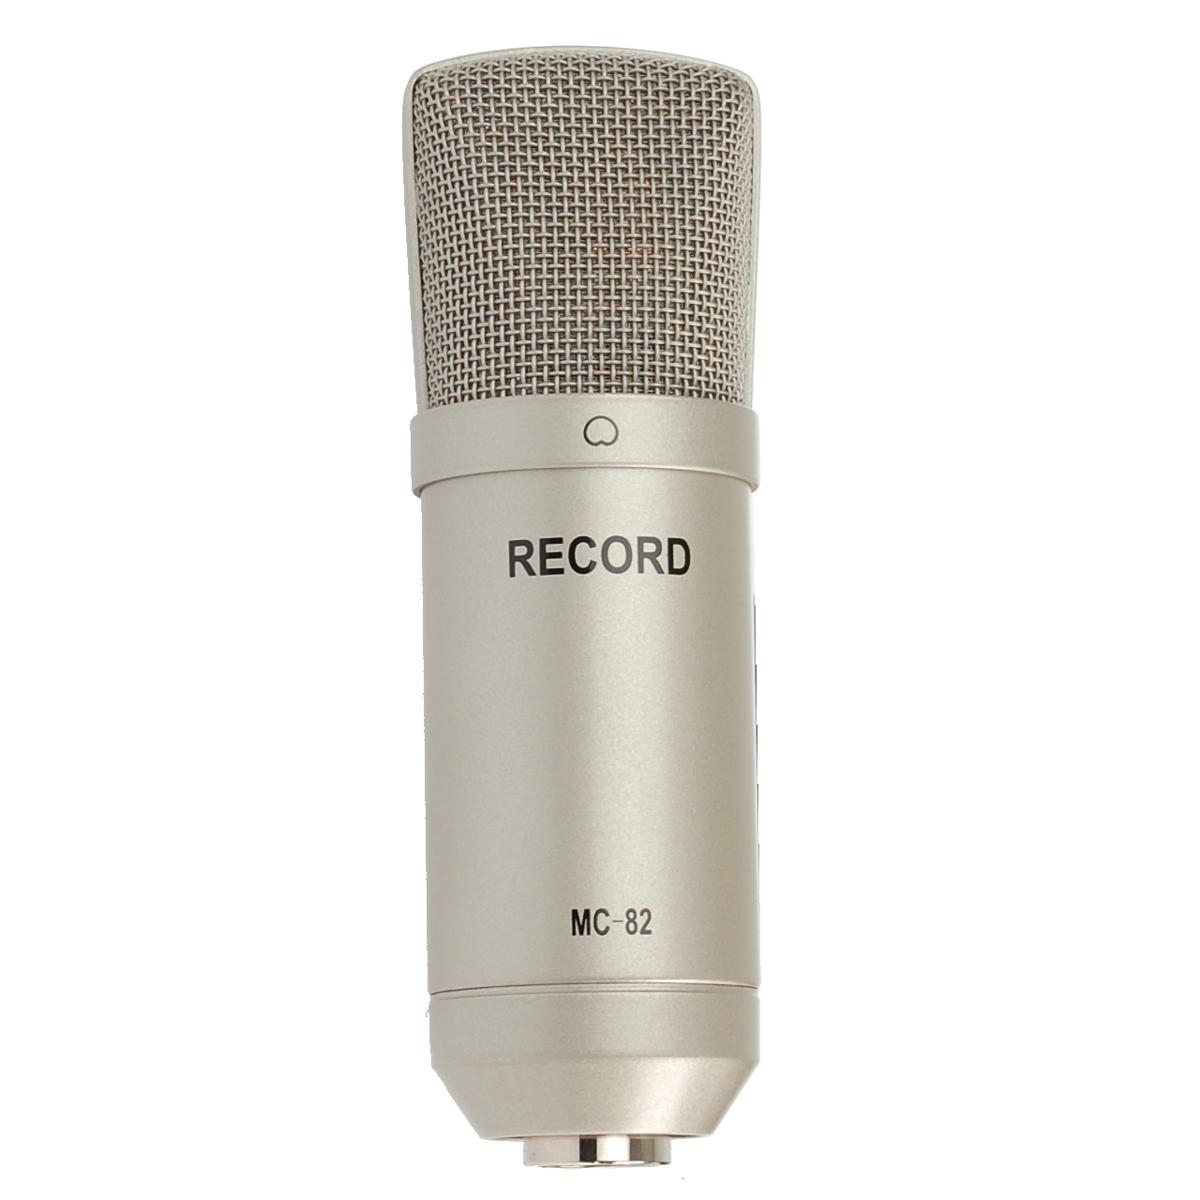 Billede af Record MC-82 kondensator-mikrofon